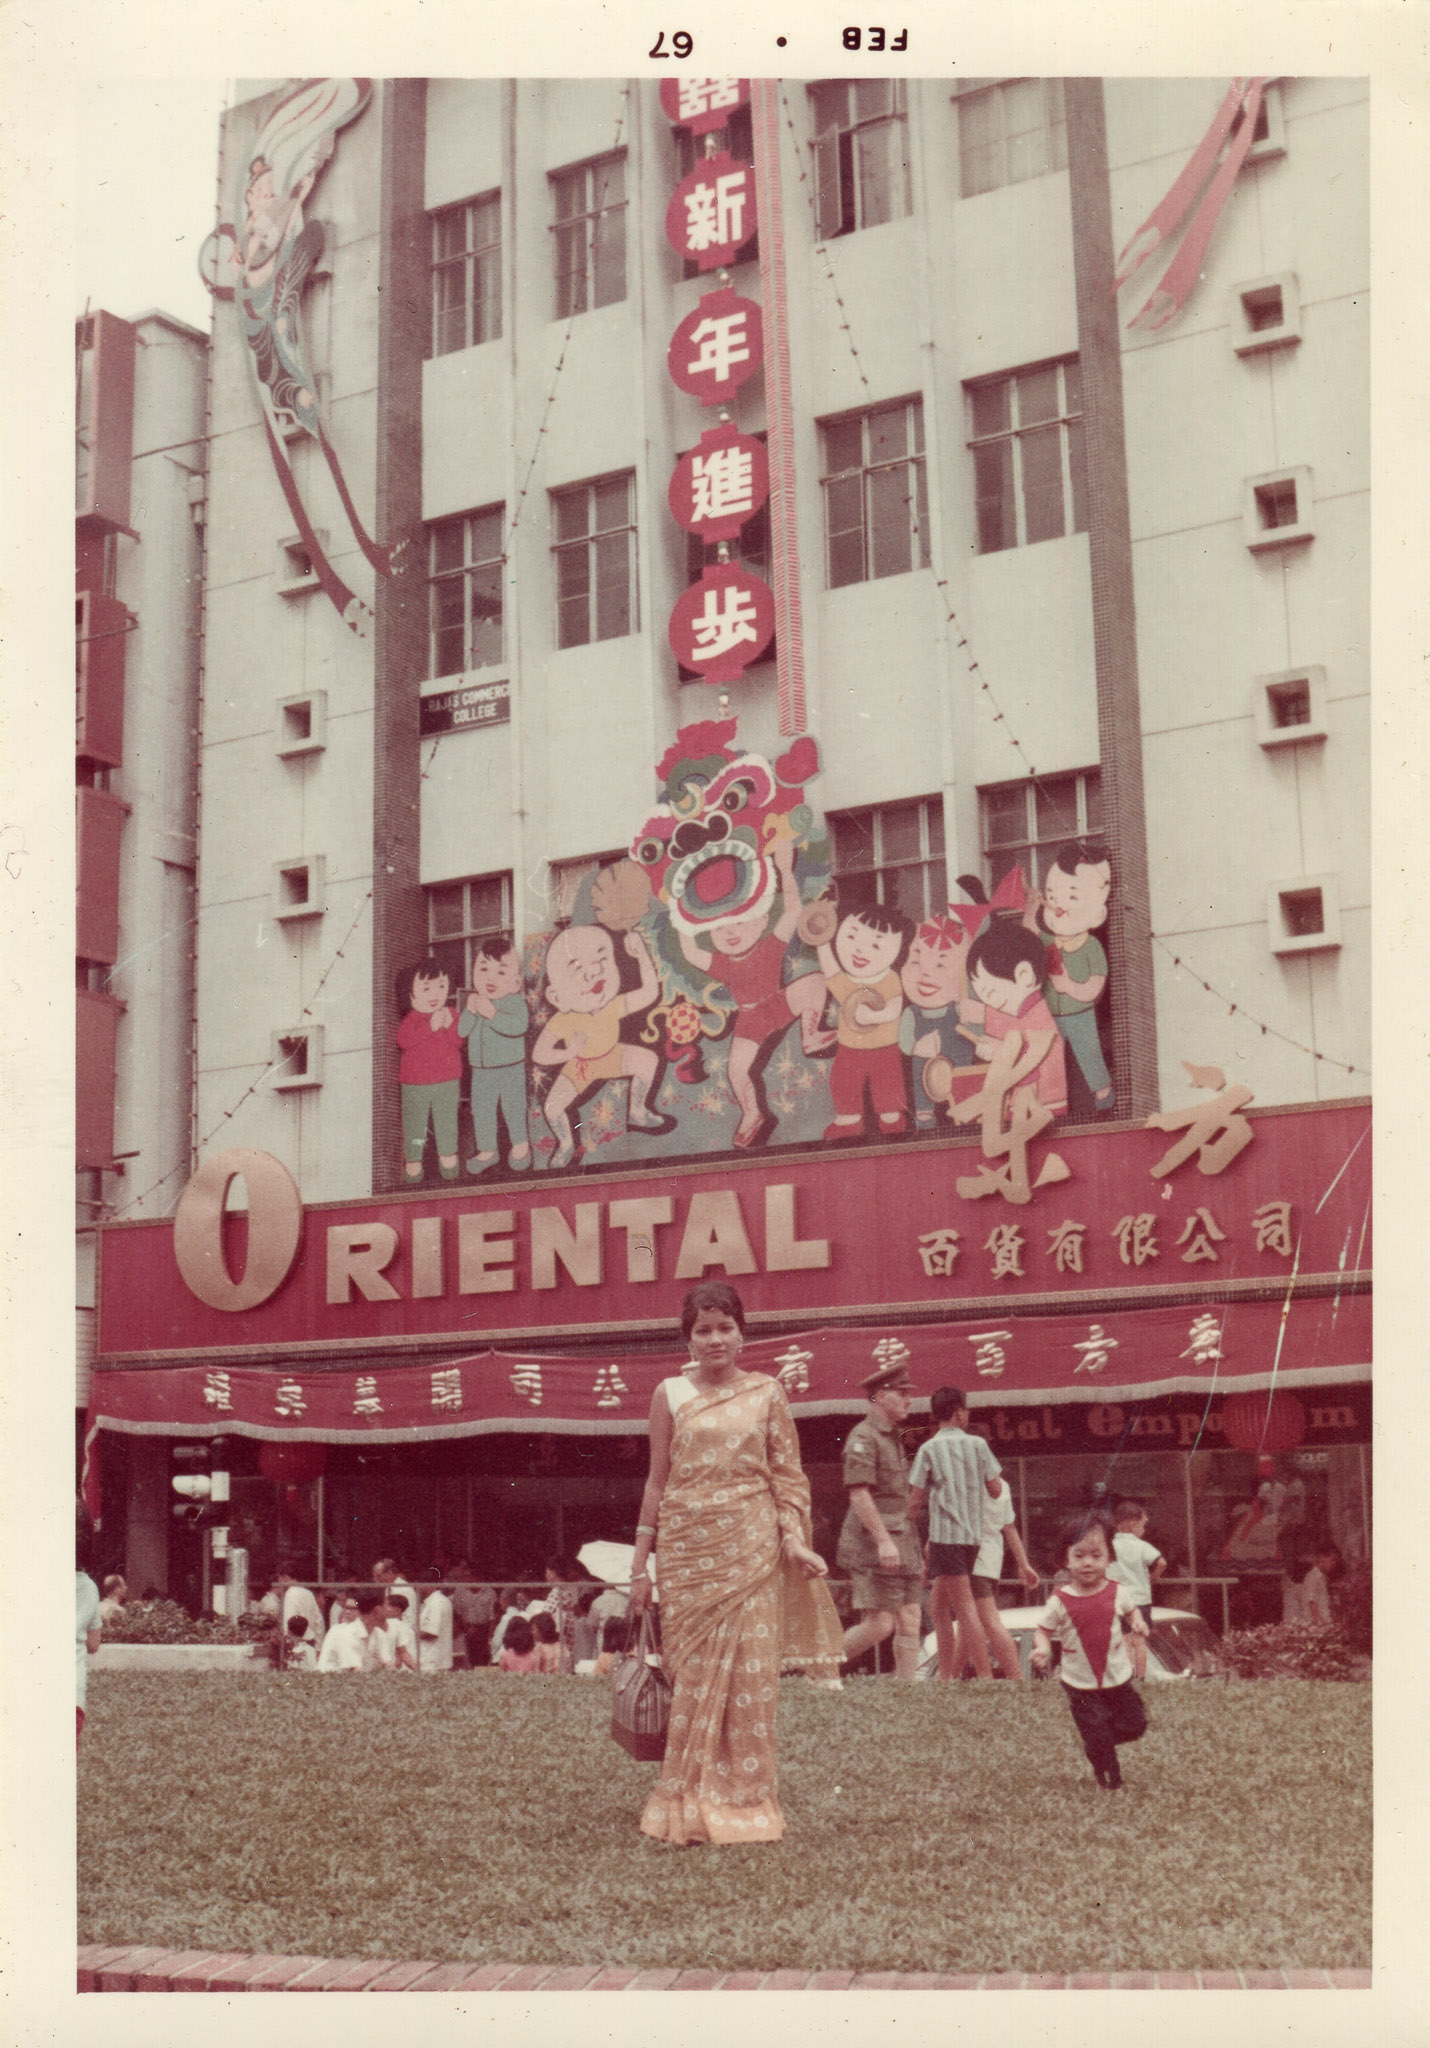 singapore-gurkhas-archive-photo-museum-zakaria-zainal-57.jpg